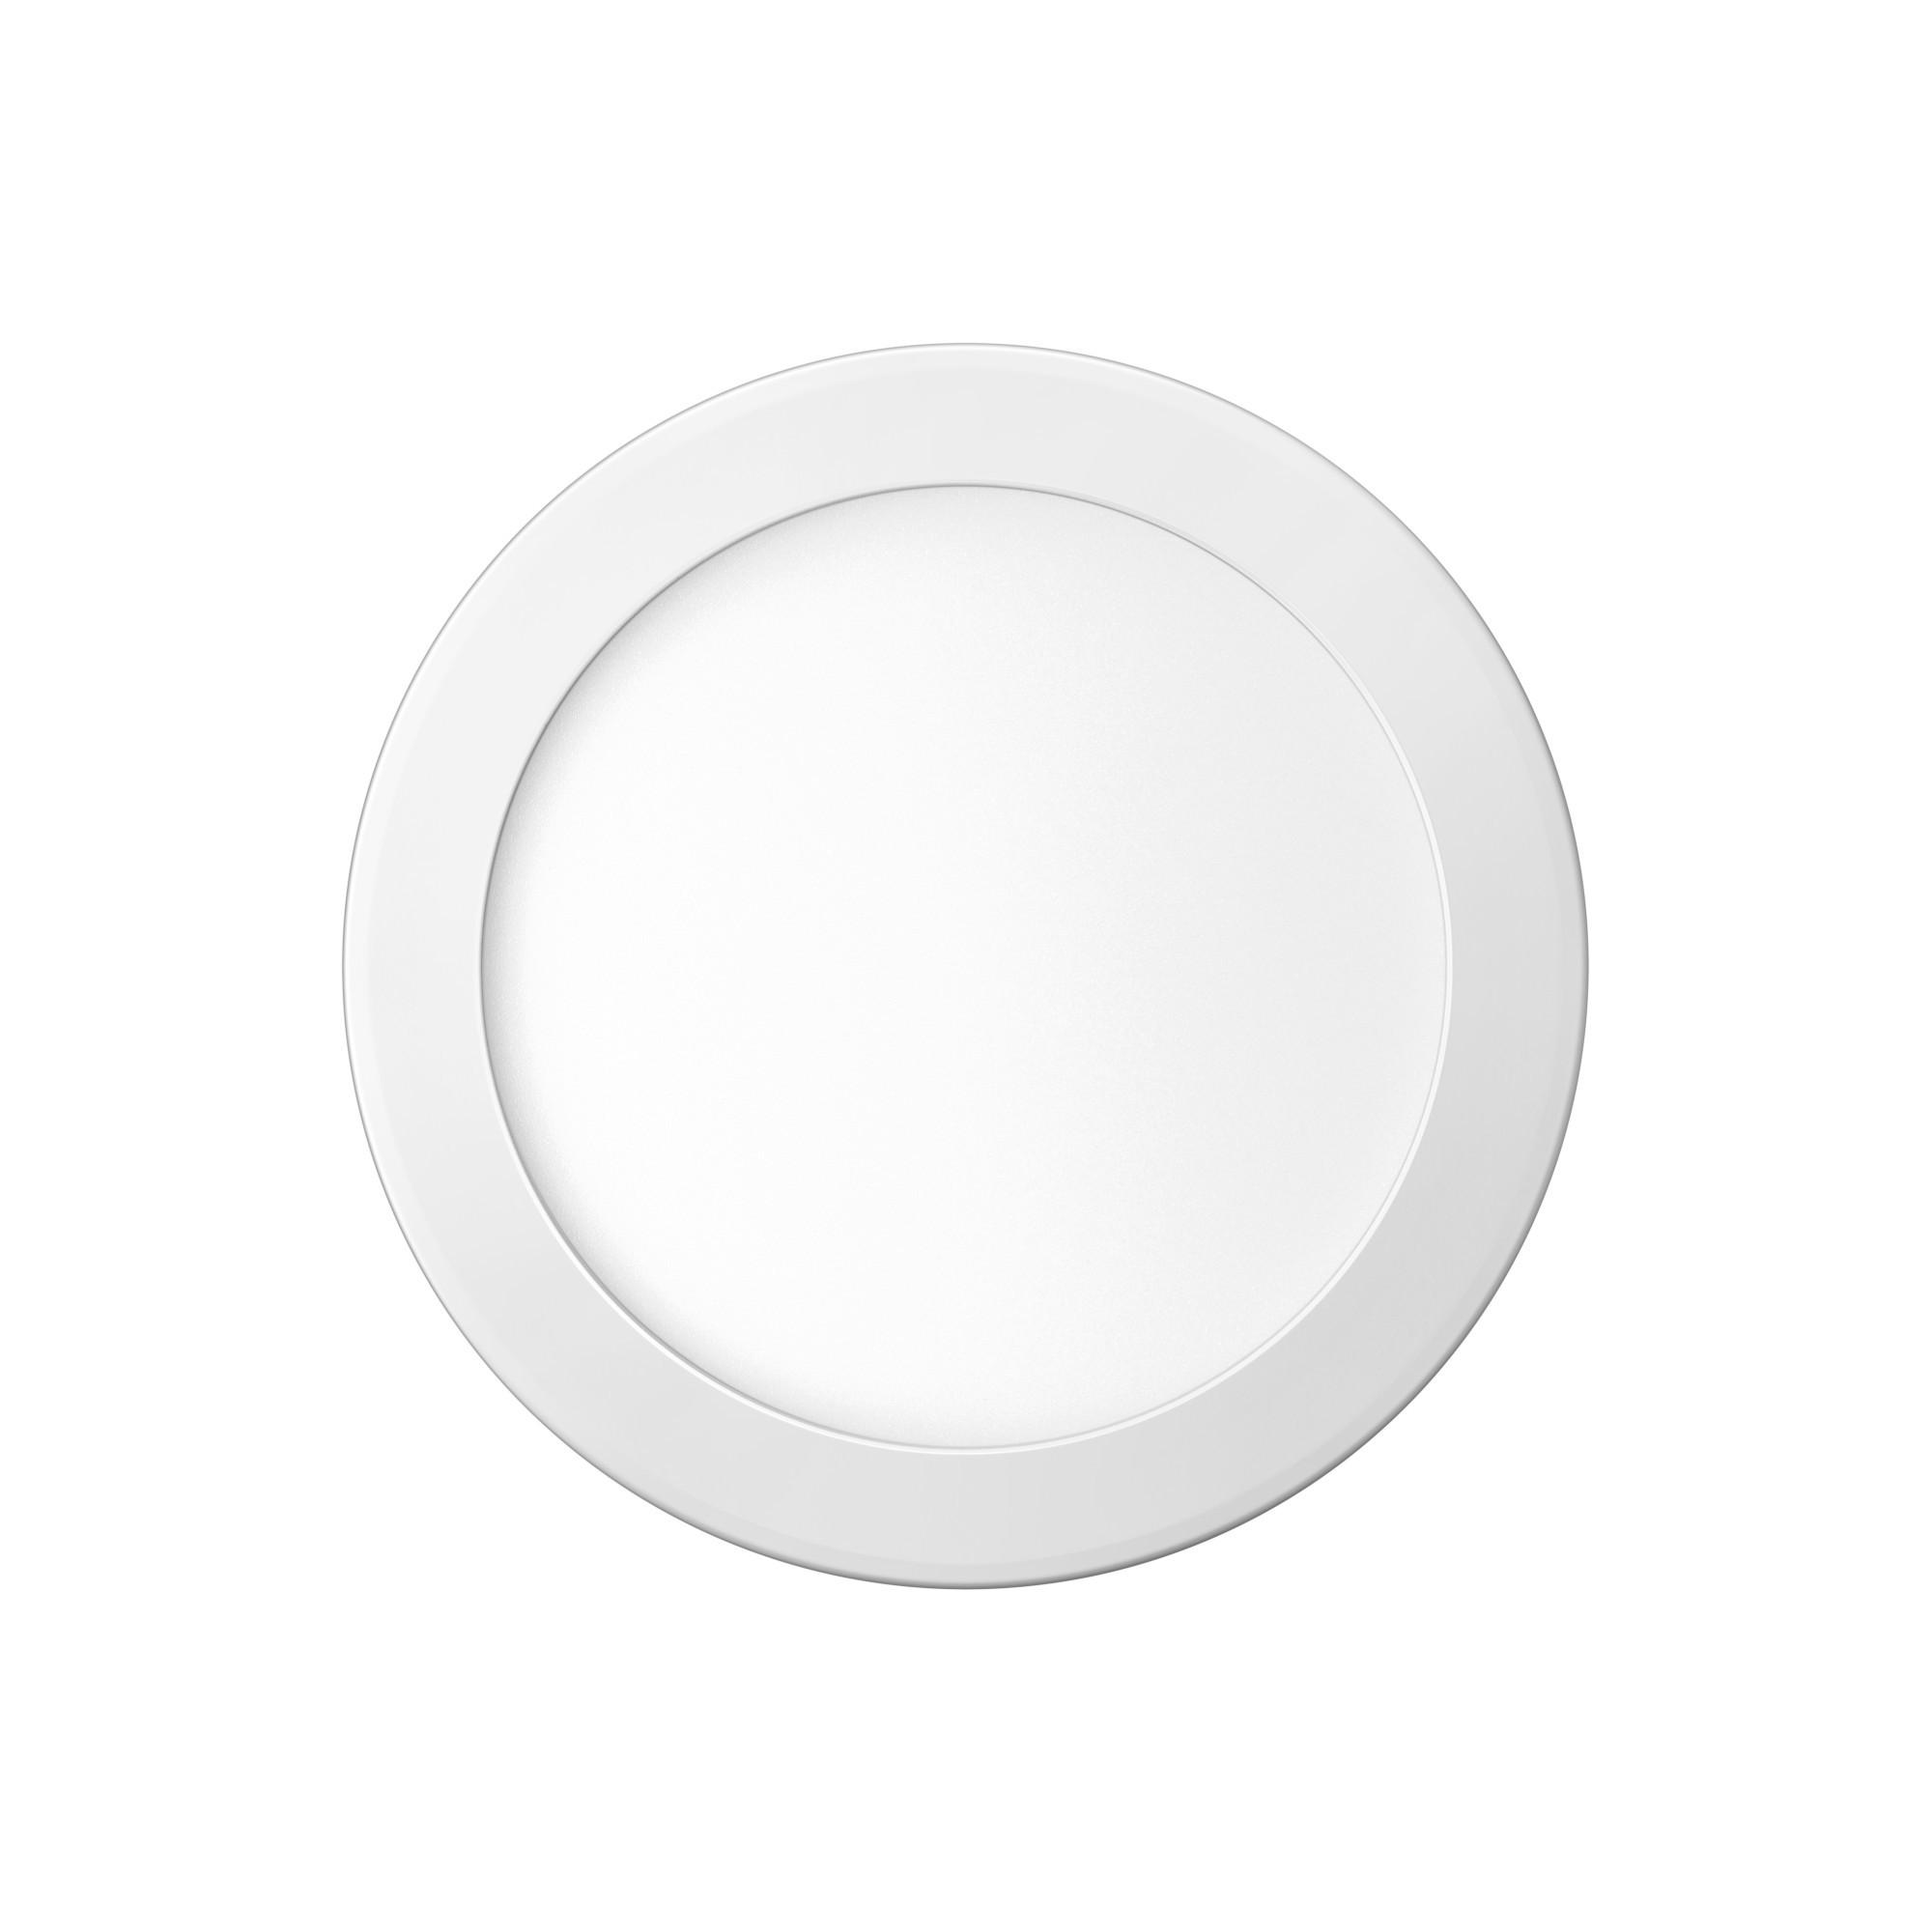 Painel LED Embutir 24W Redondo Luz Branca - Elgin